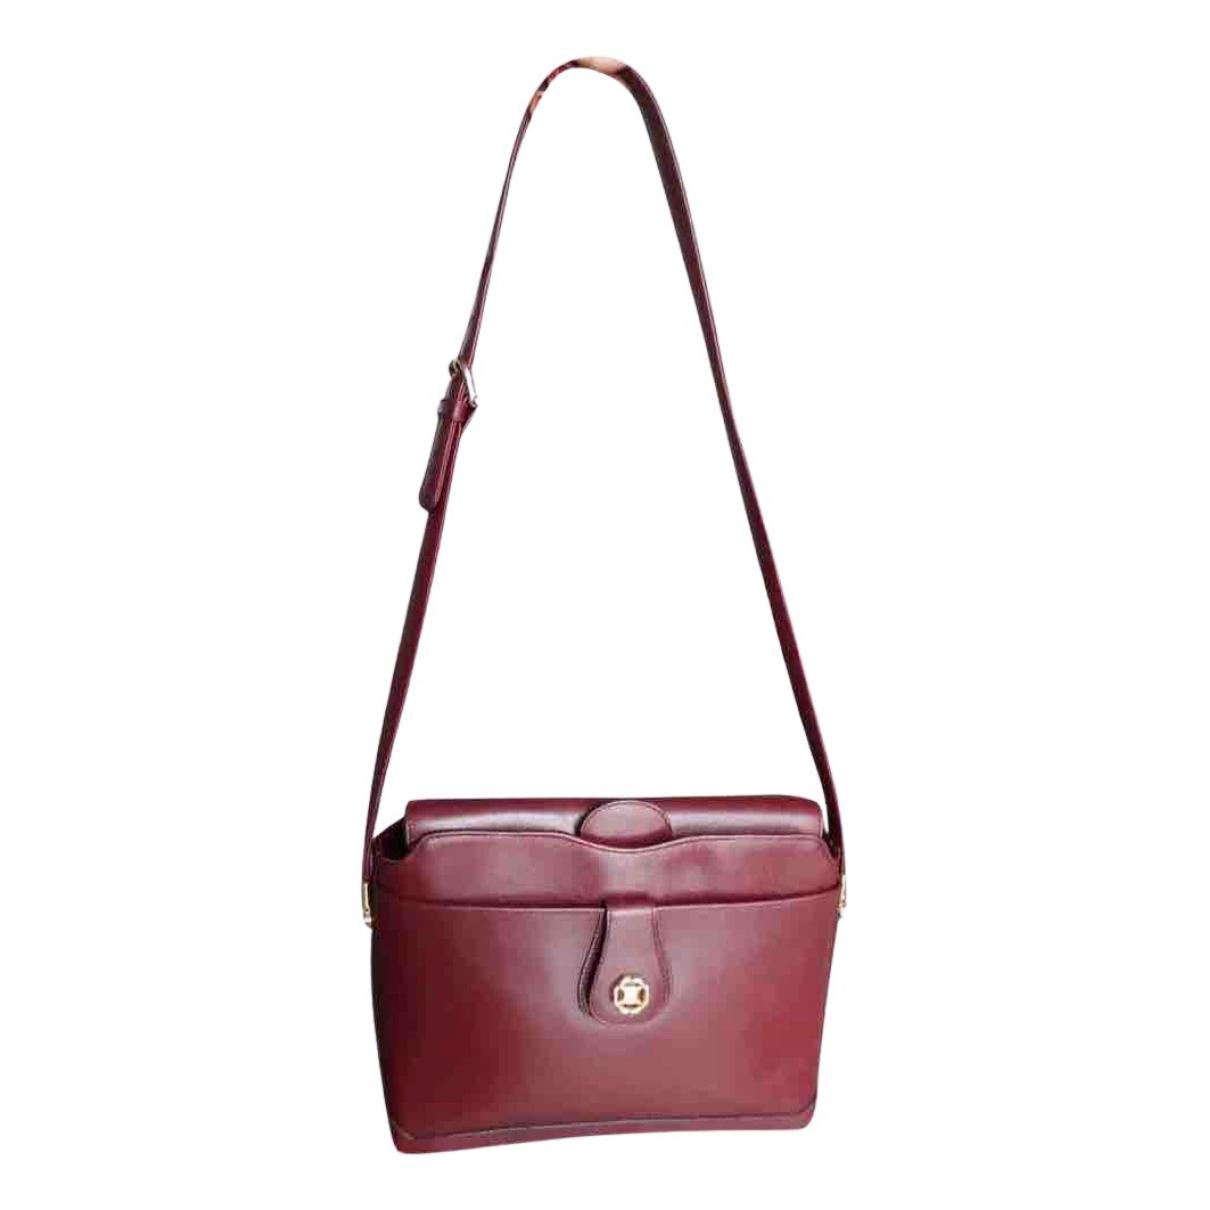 Celine Triomphe Vintage Burgundy Leather handbag for Women N